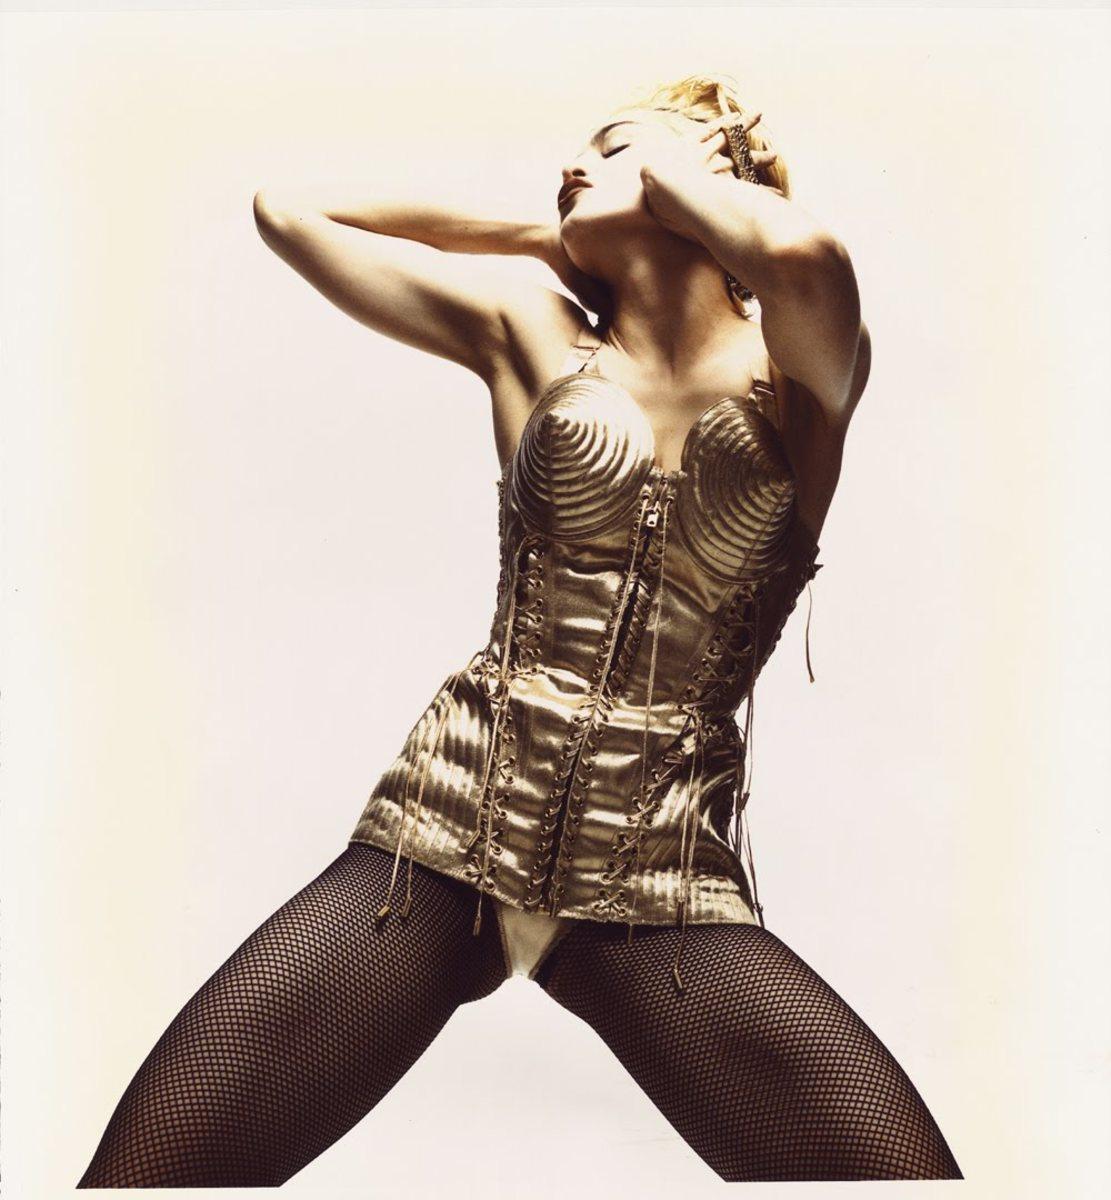 Madonna in Jean Paul Gaultier's famous Corset